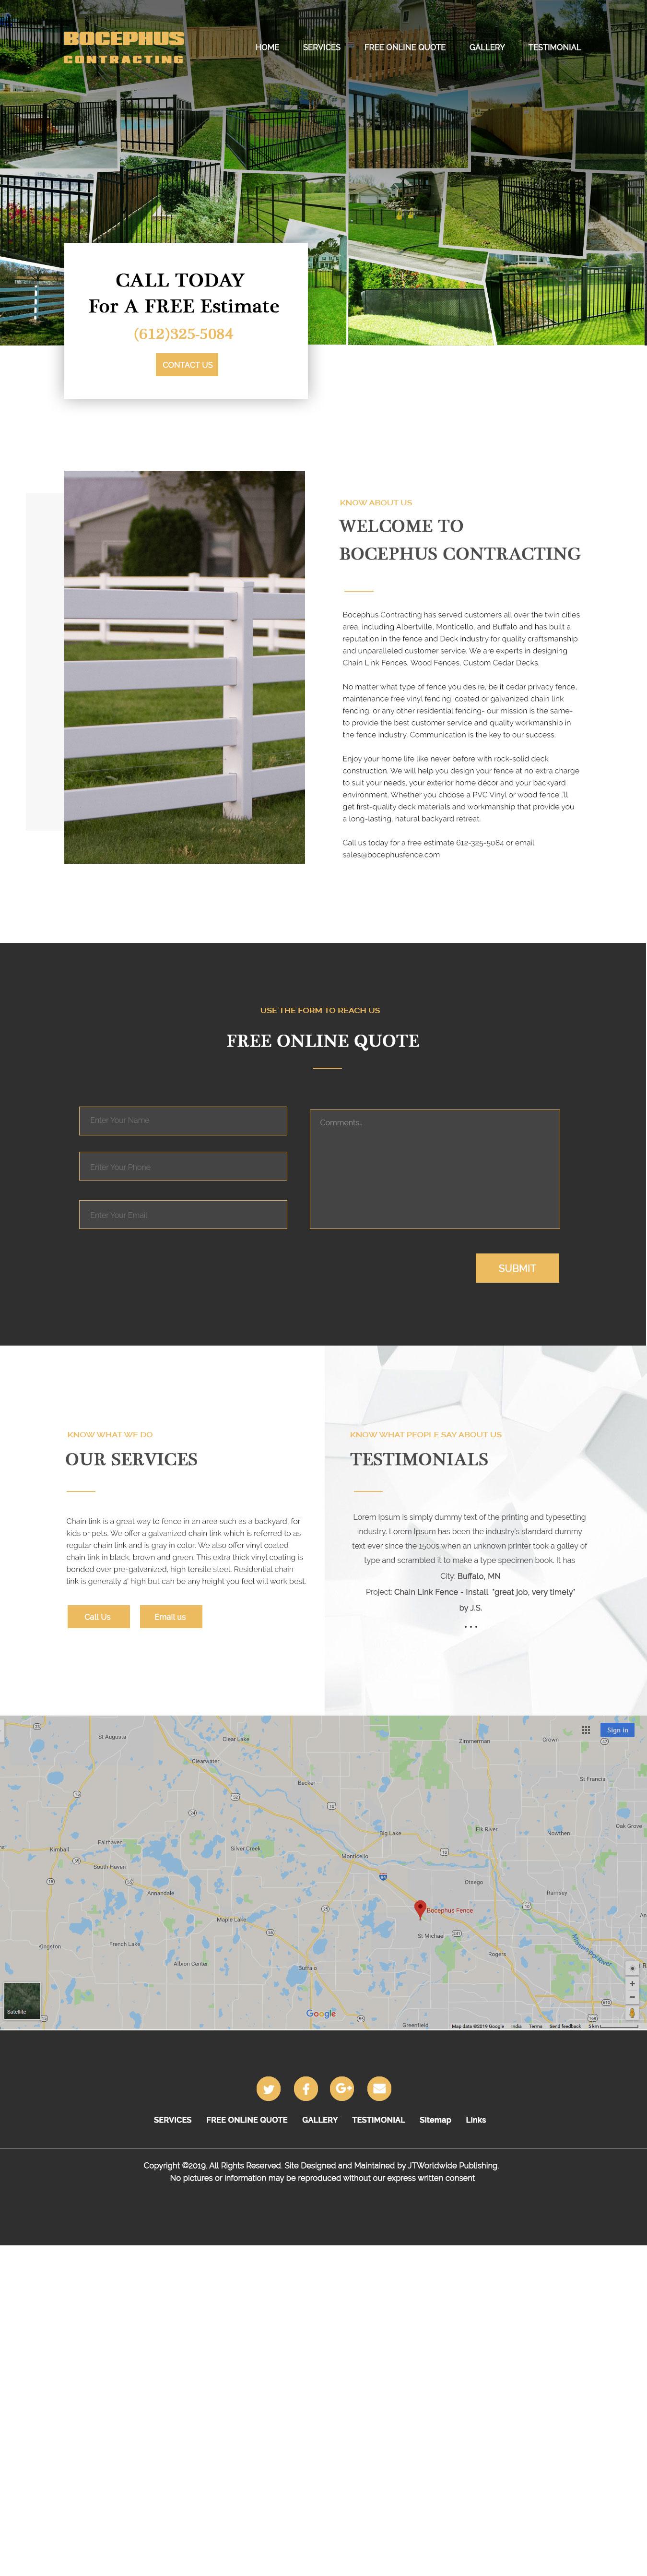 Web Designing Company In Trivandrum Top Web Designers